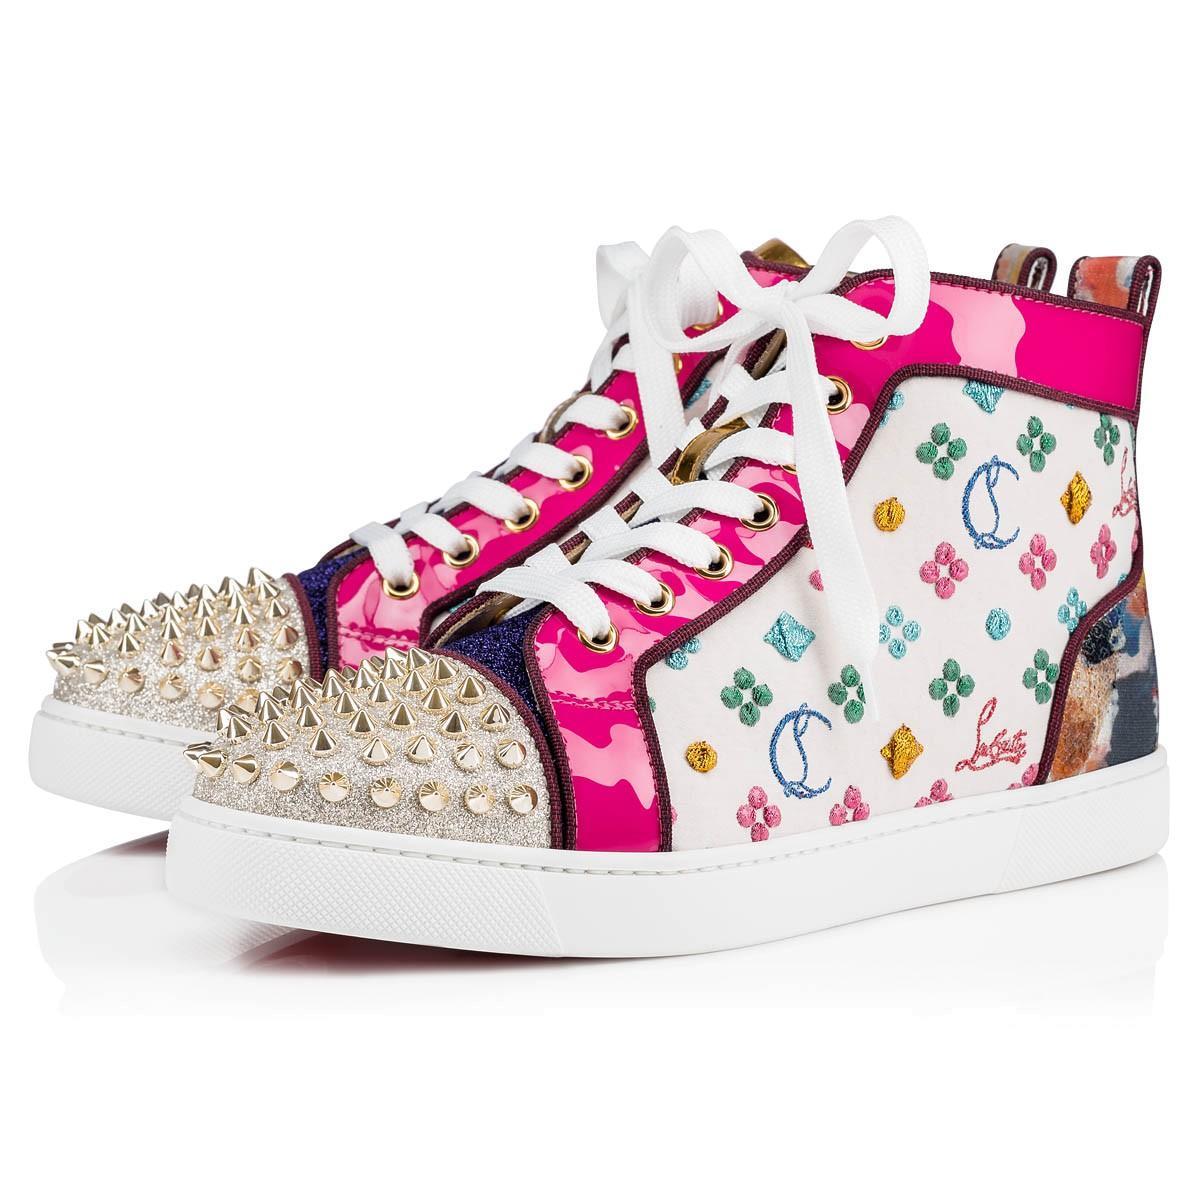 9ab7fd4e2ea Christian Louboutin Lou Spikes Woman Orlato Flat in Pink - Lyst